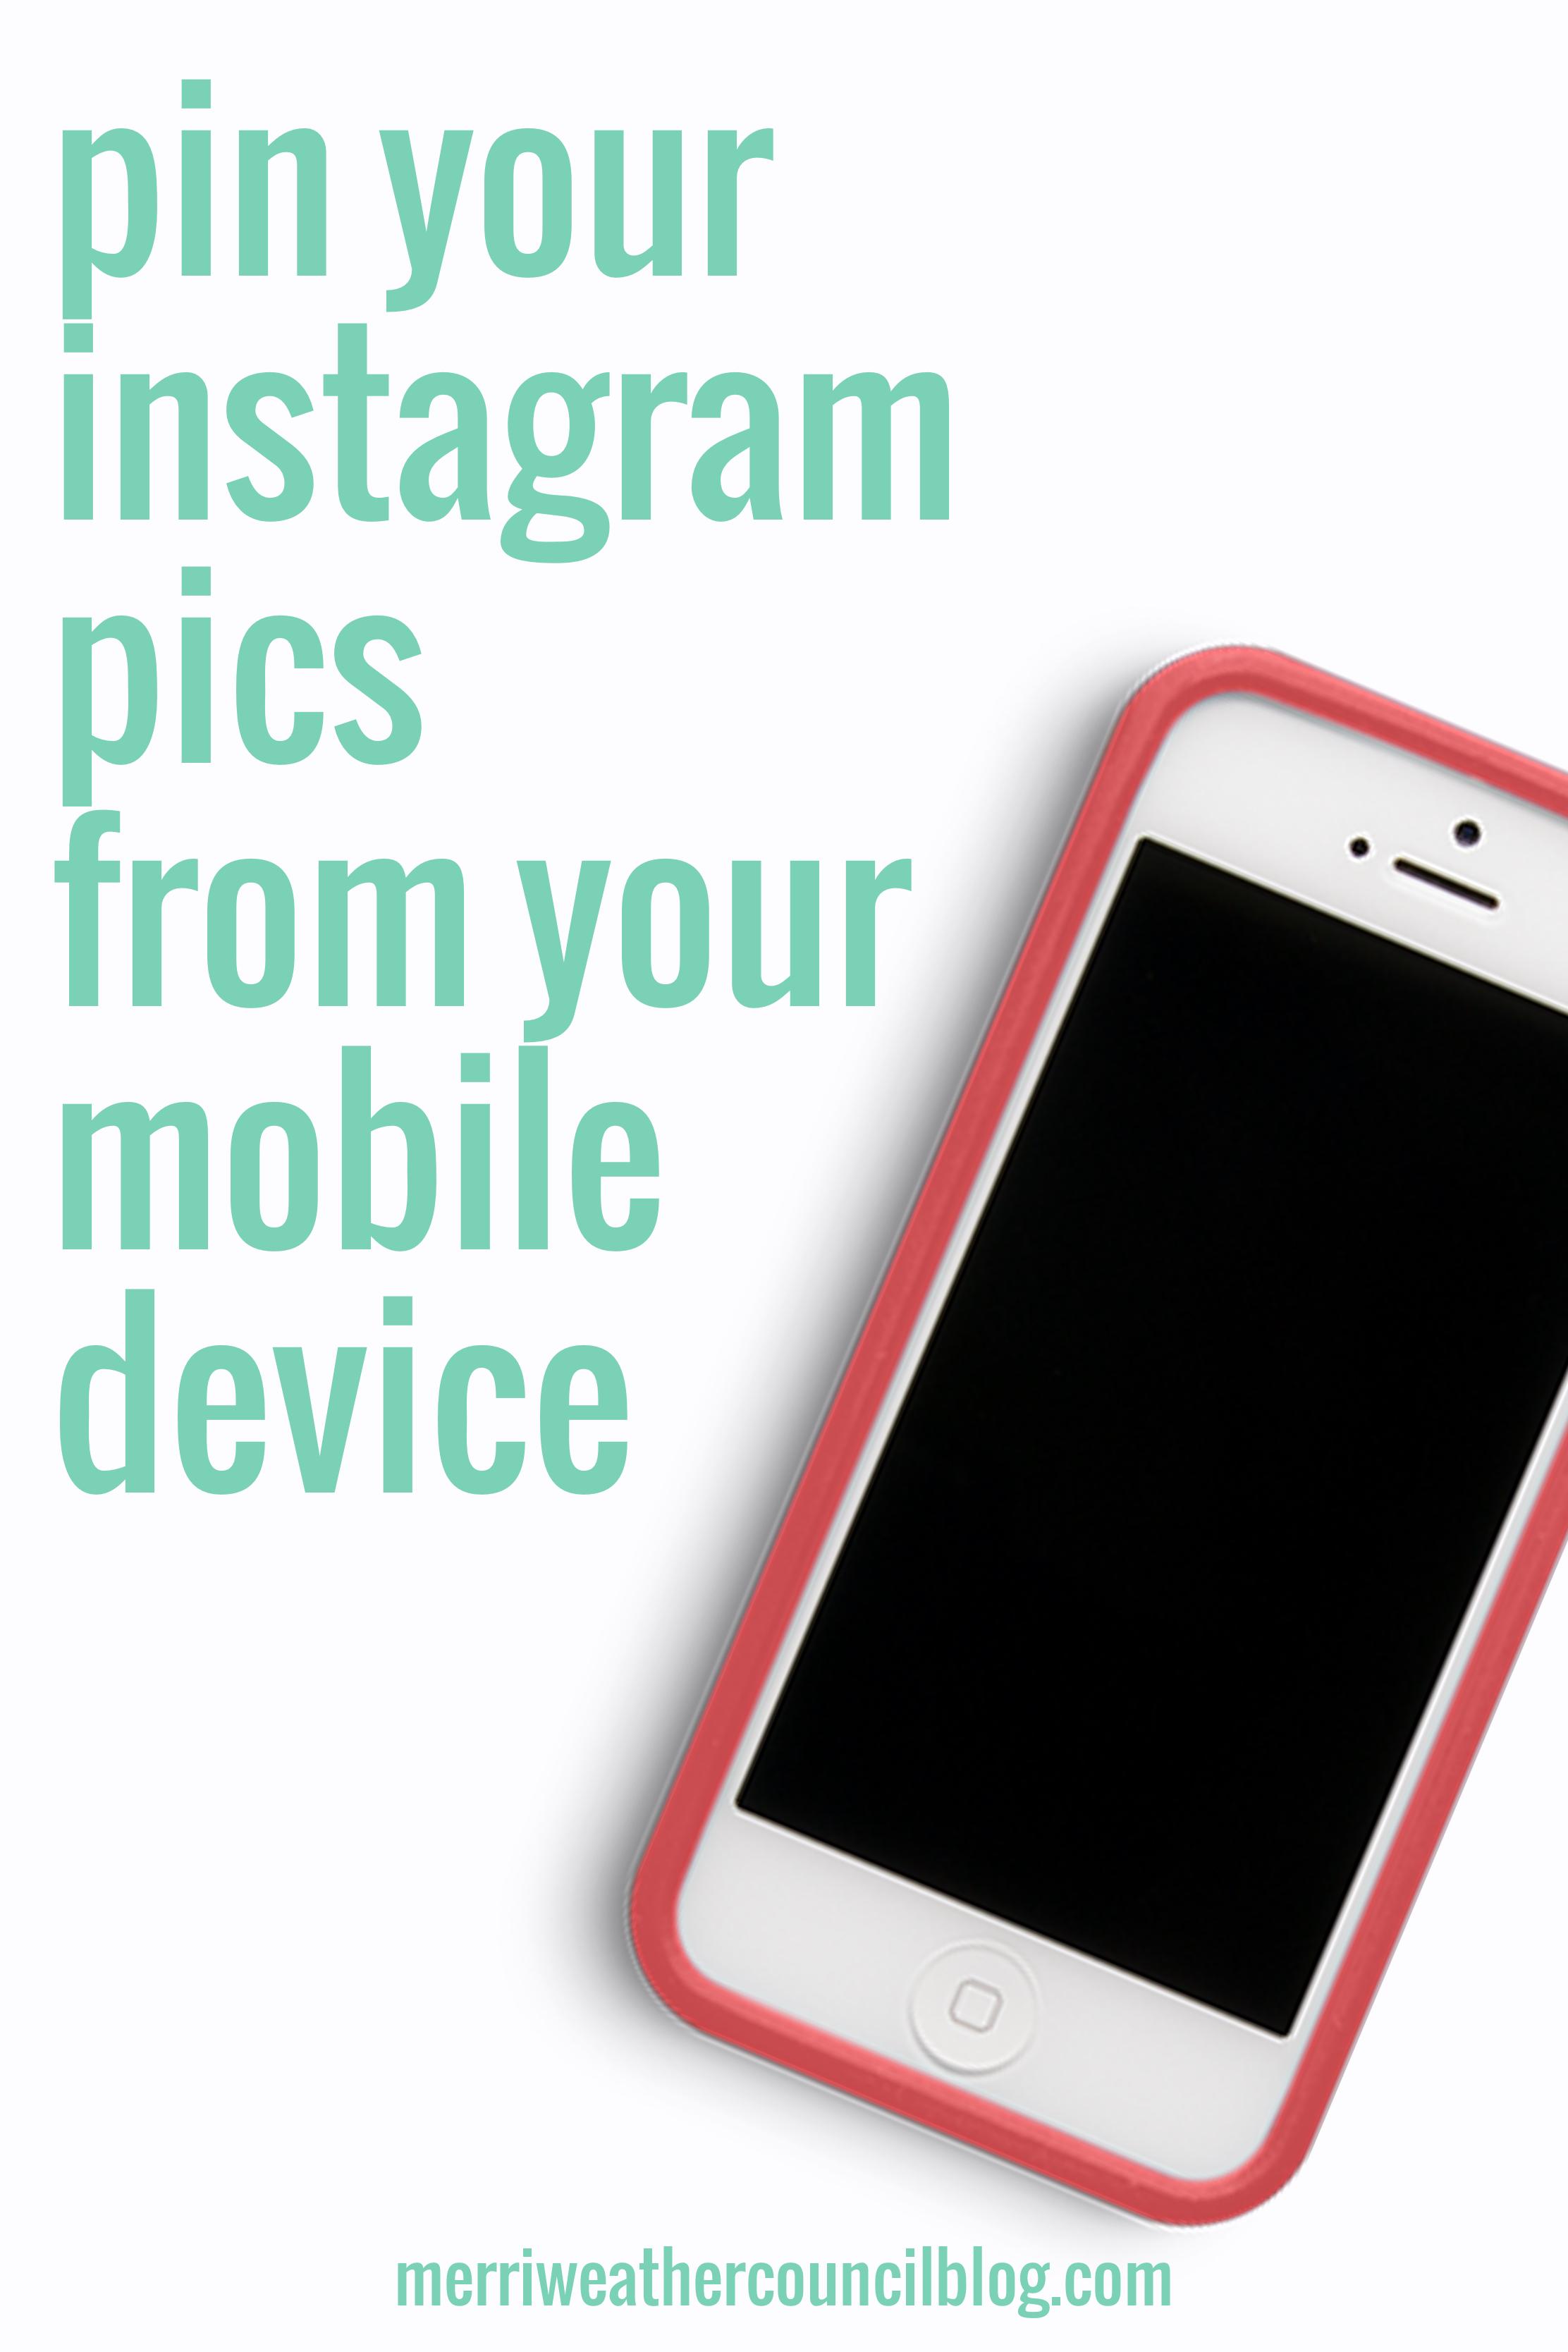 how to delete instagram pics on computer